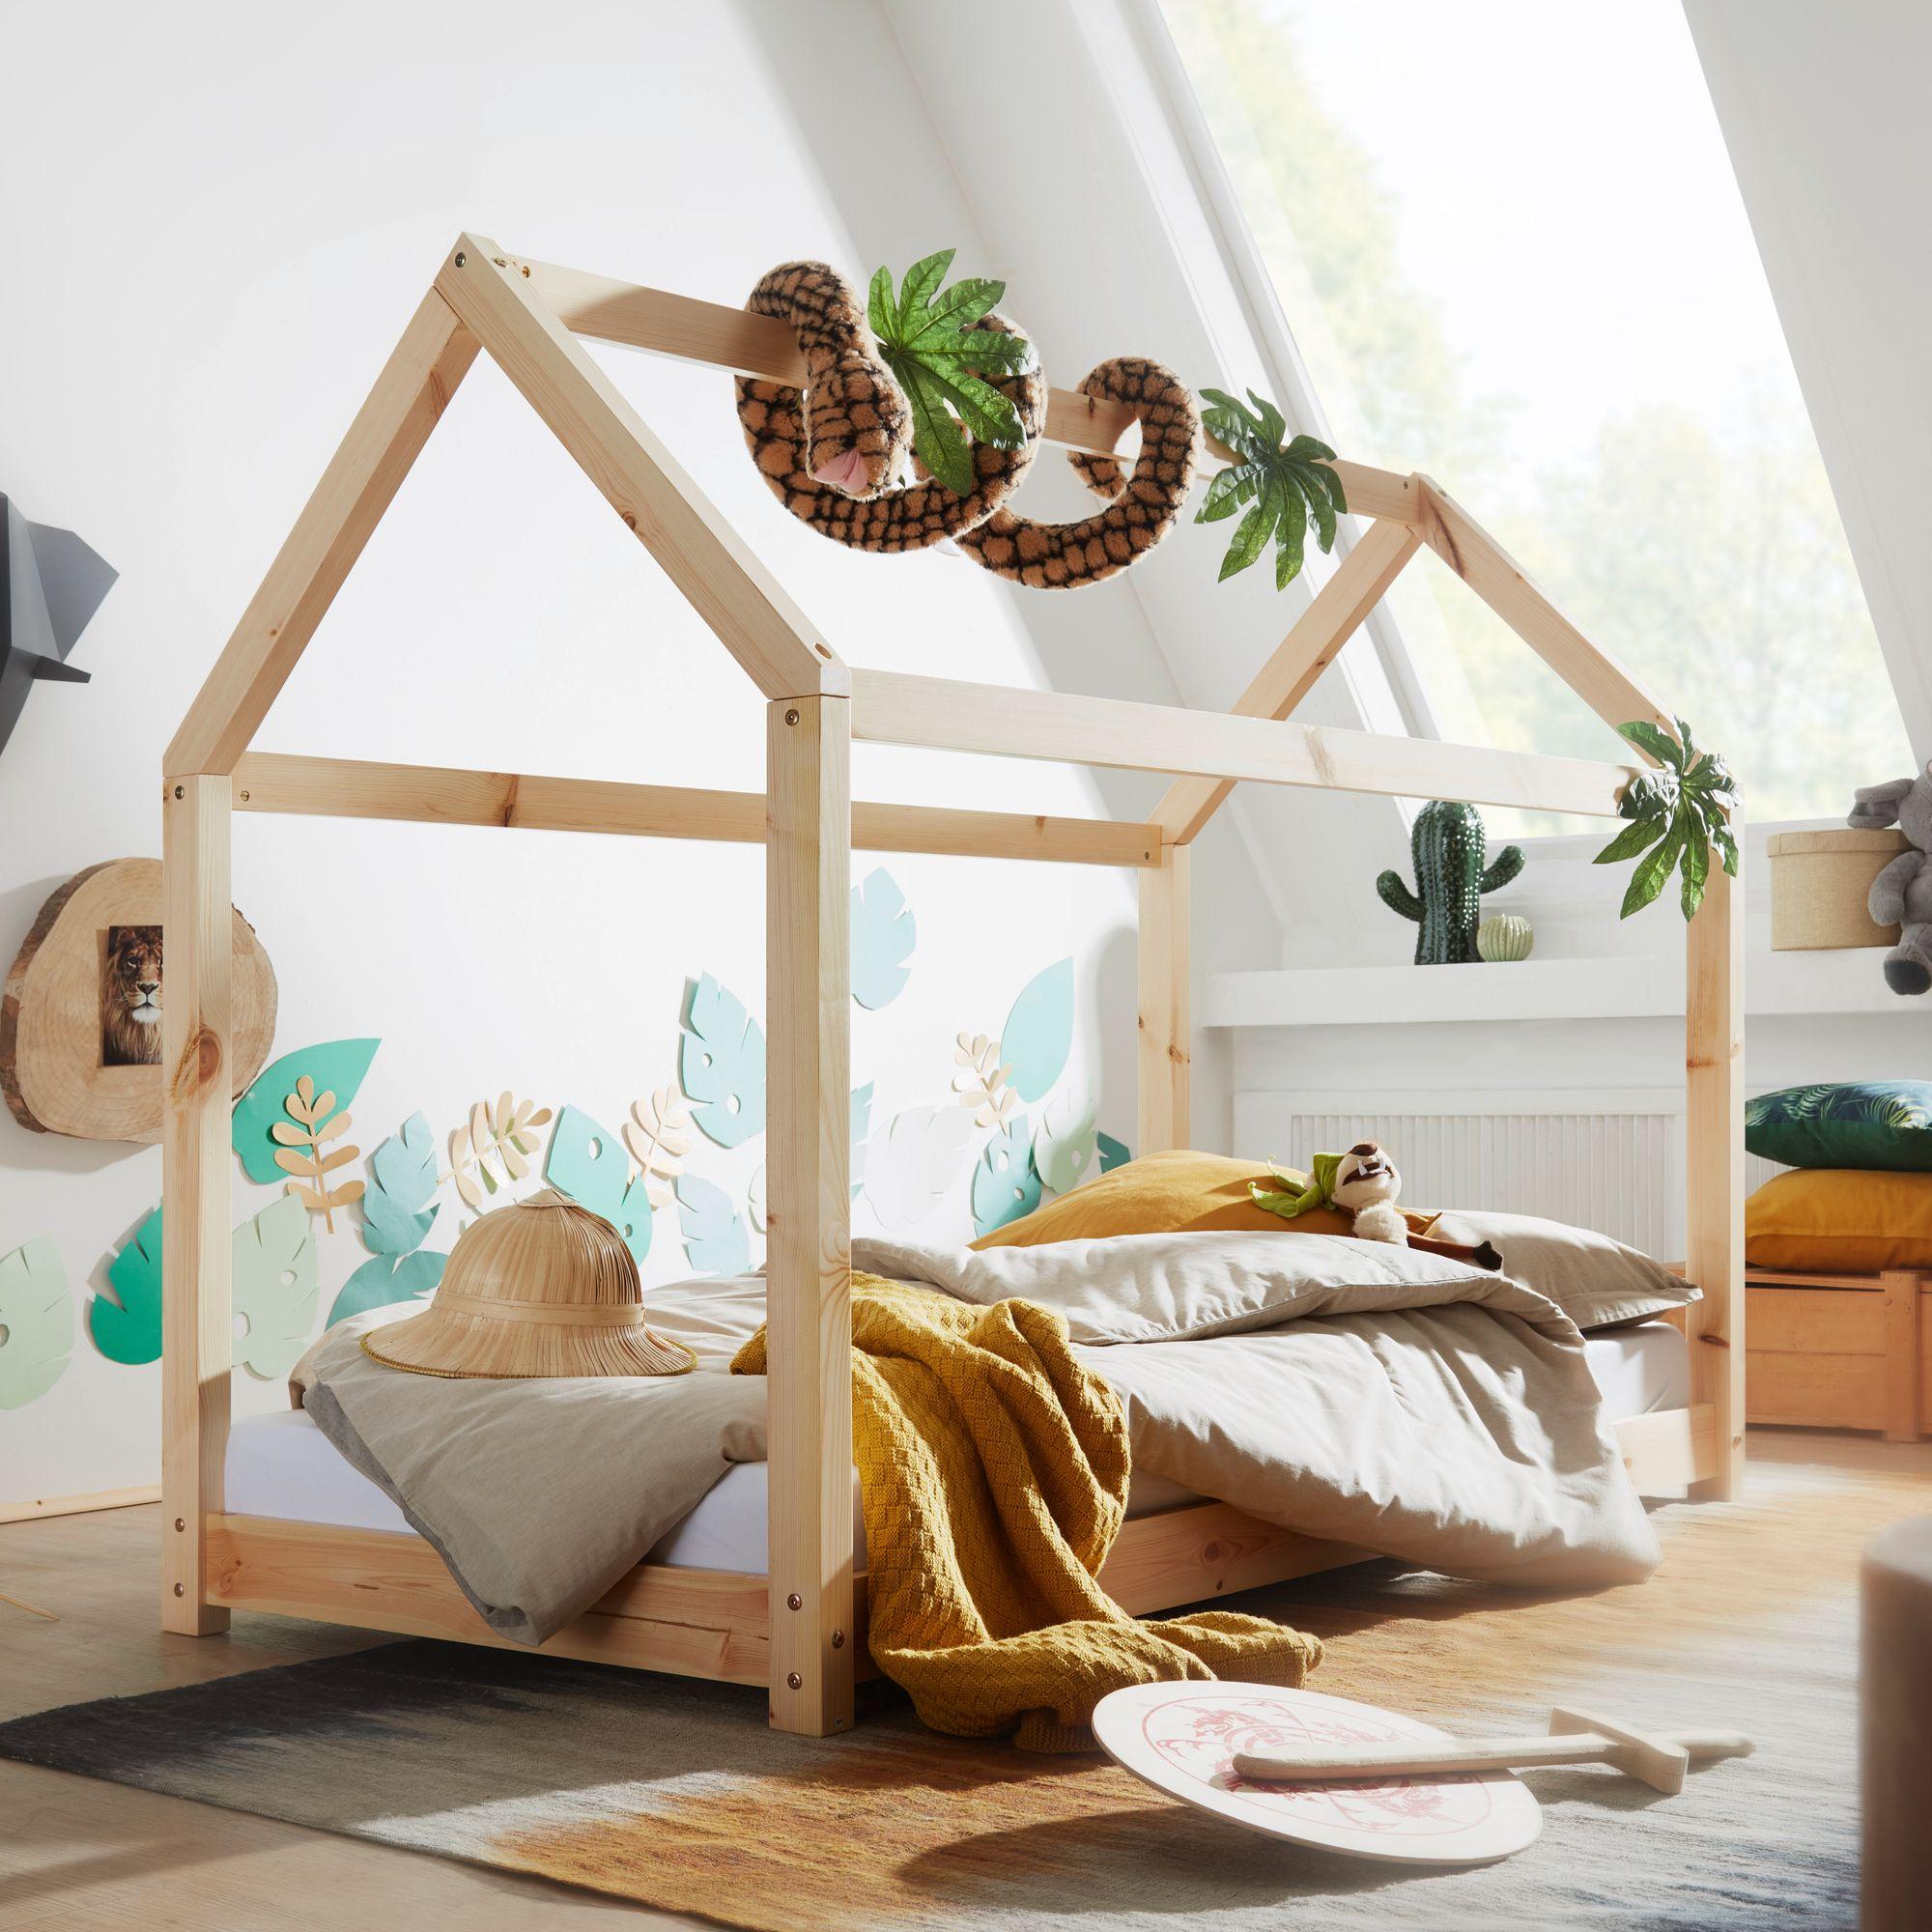 Full Size of Wohnling Kinderbett Haus 160x80 Cm Kiefer Holz Bett Kinder Luxus Betten Trends Günstige Ohne Kopfteil Ruf Preise Ebay 180x200 Schlafzimmer Komplett Massivholz Bett Betten Holz